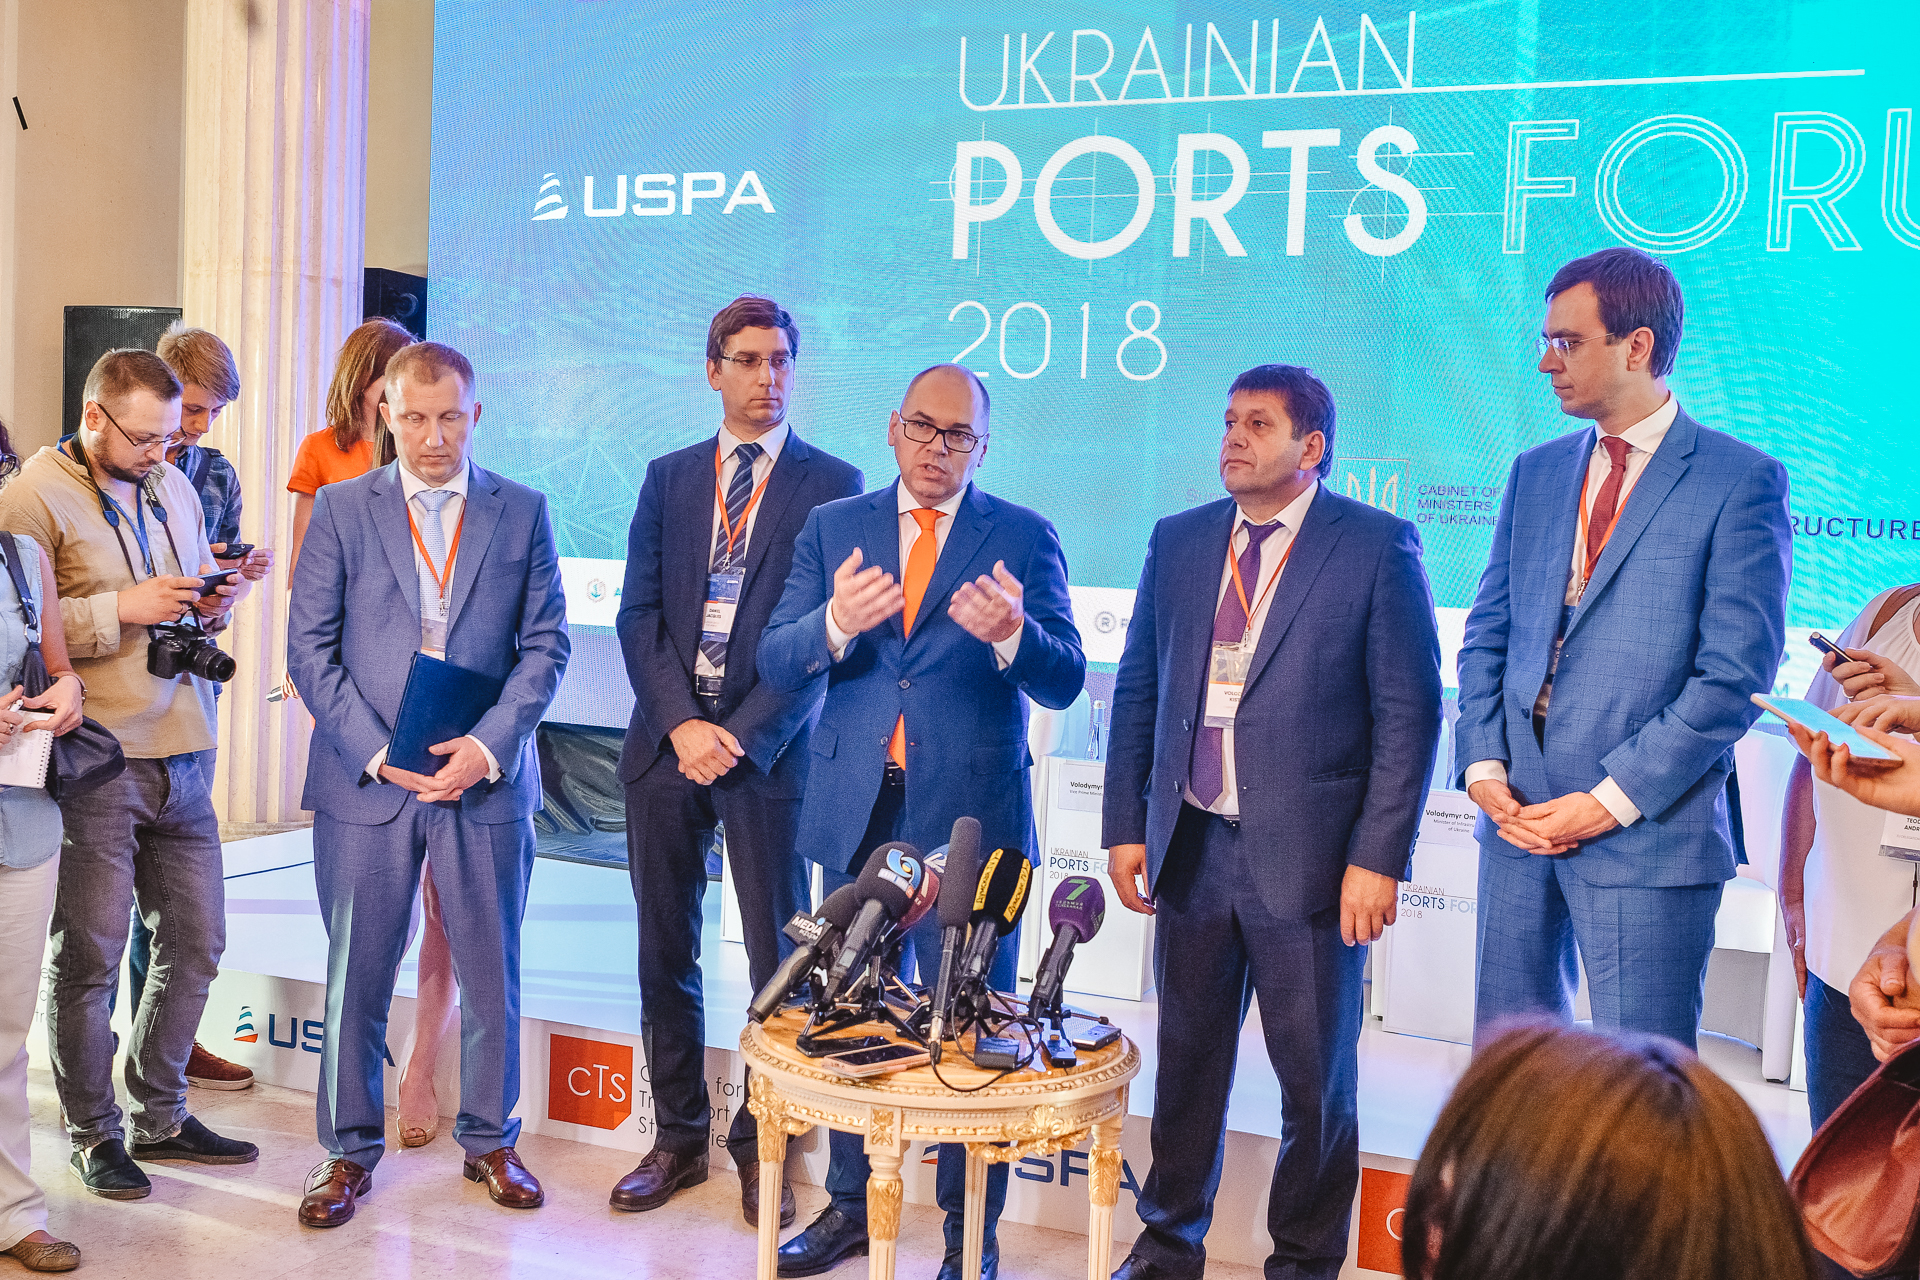 May 31 - Ukrainian Ports Forum-2018 (Odessa)